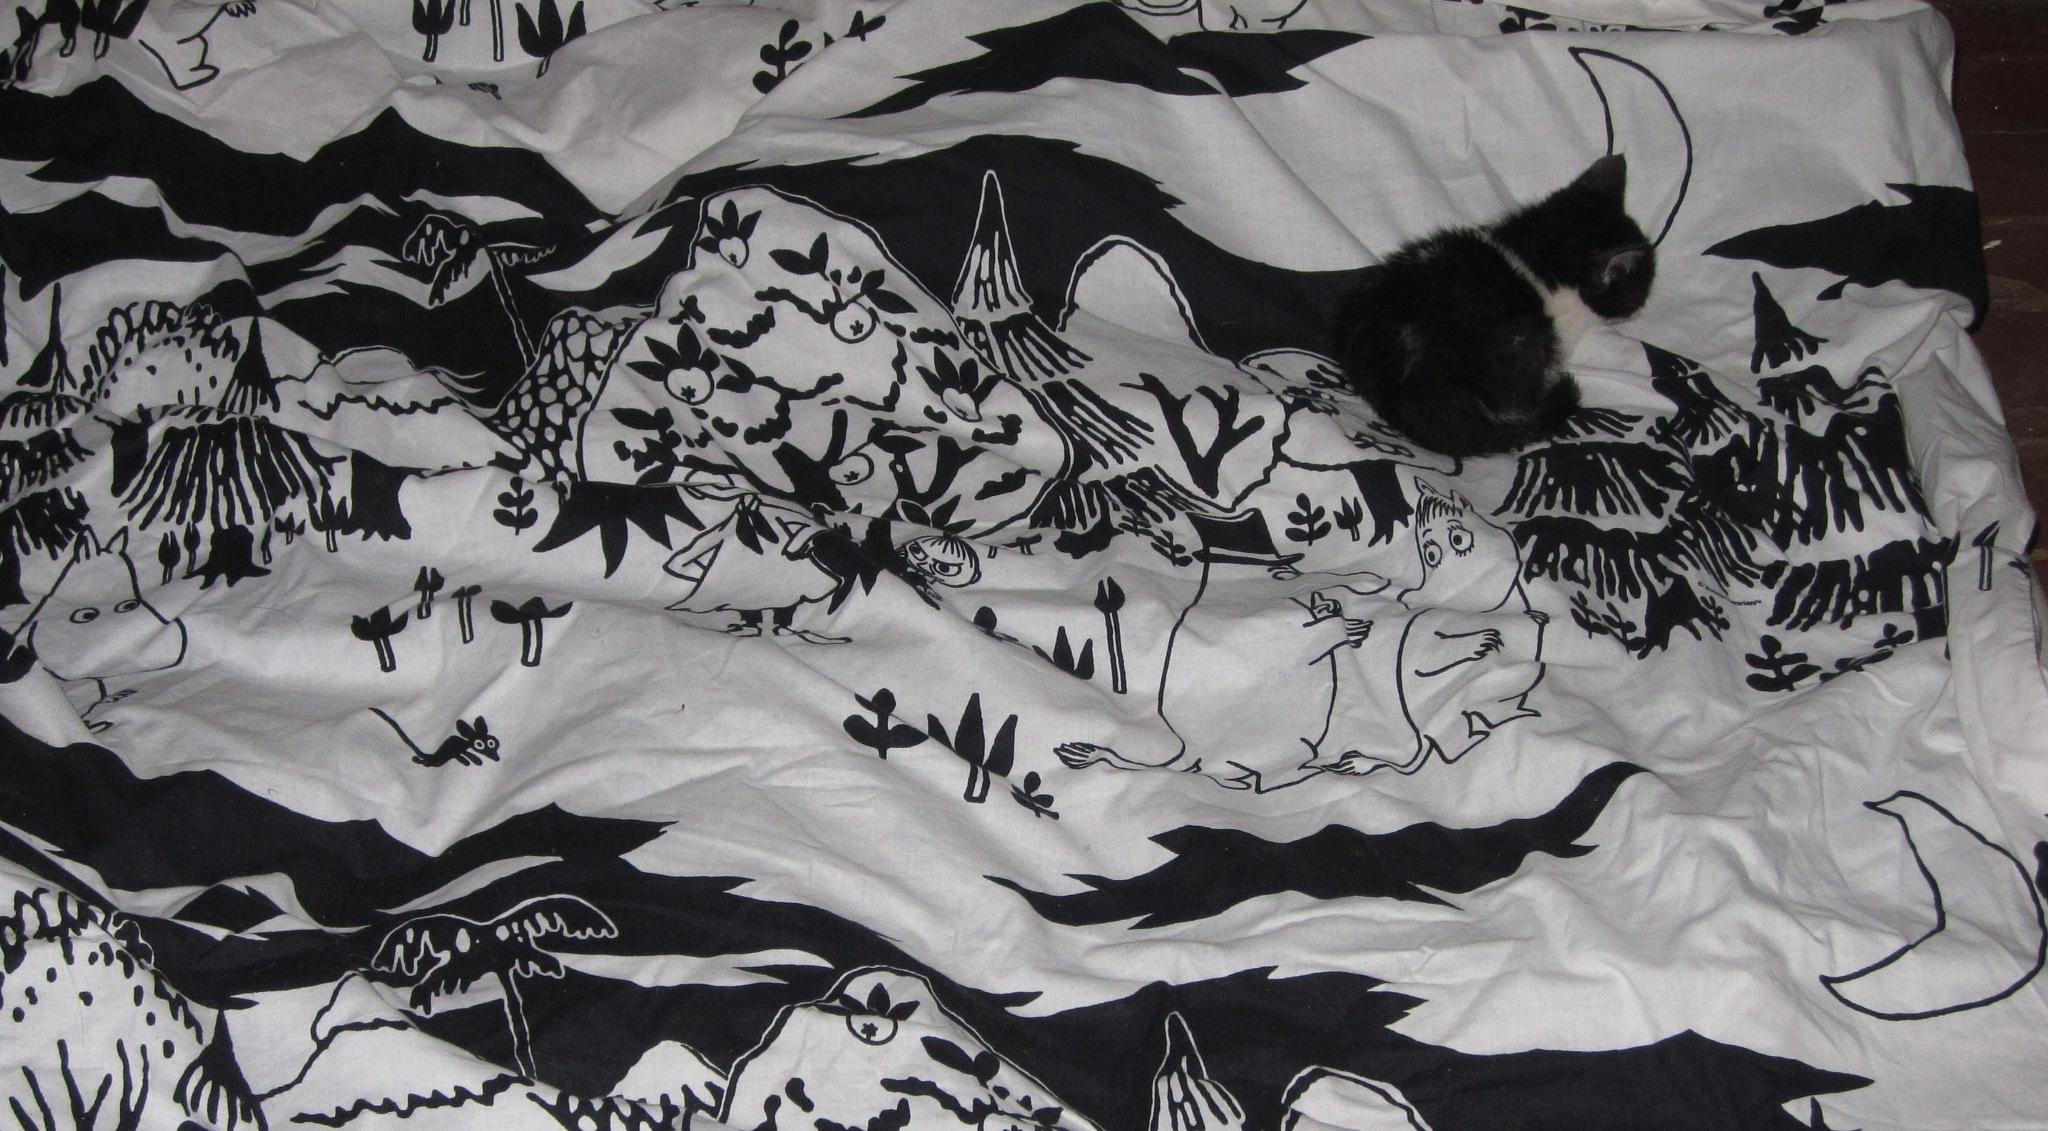 cat-mouflage-3 by anulumesadu